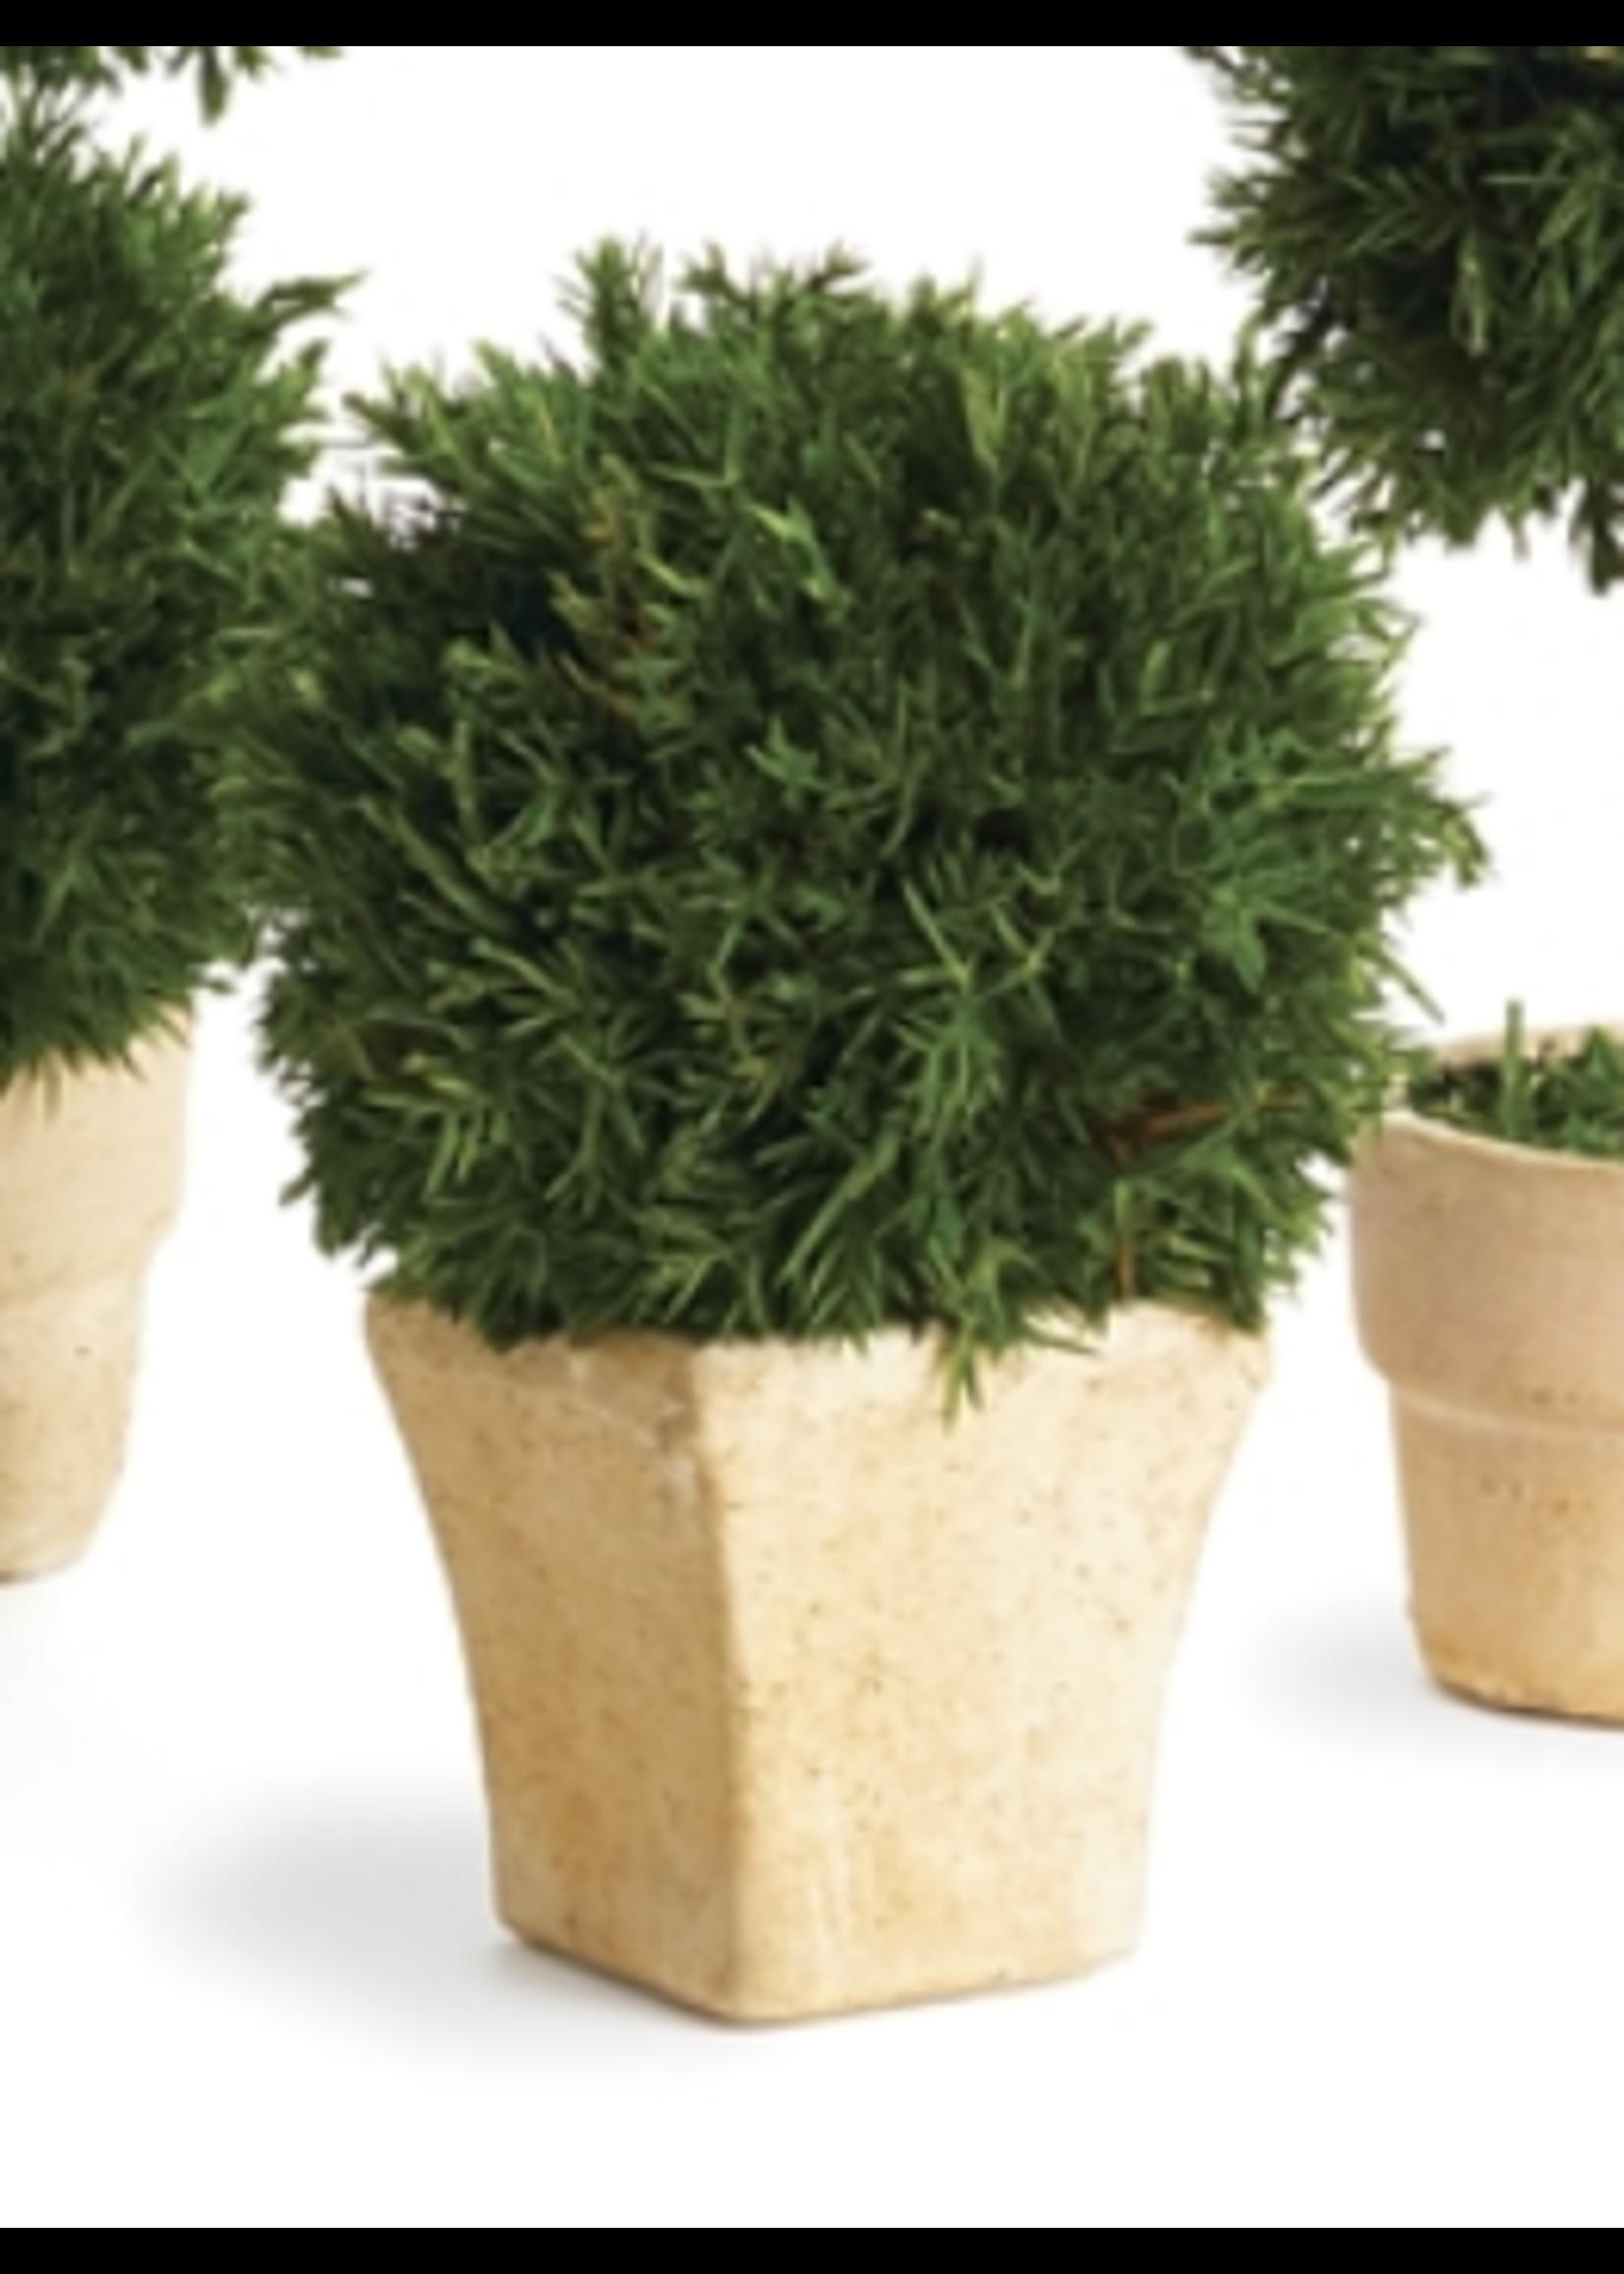 Cypress Mini Topiary in Pot - Single Ball Square